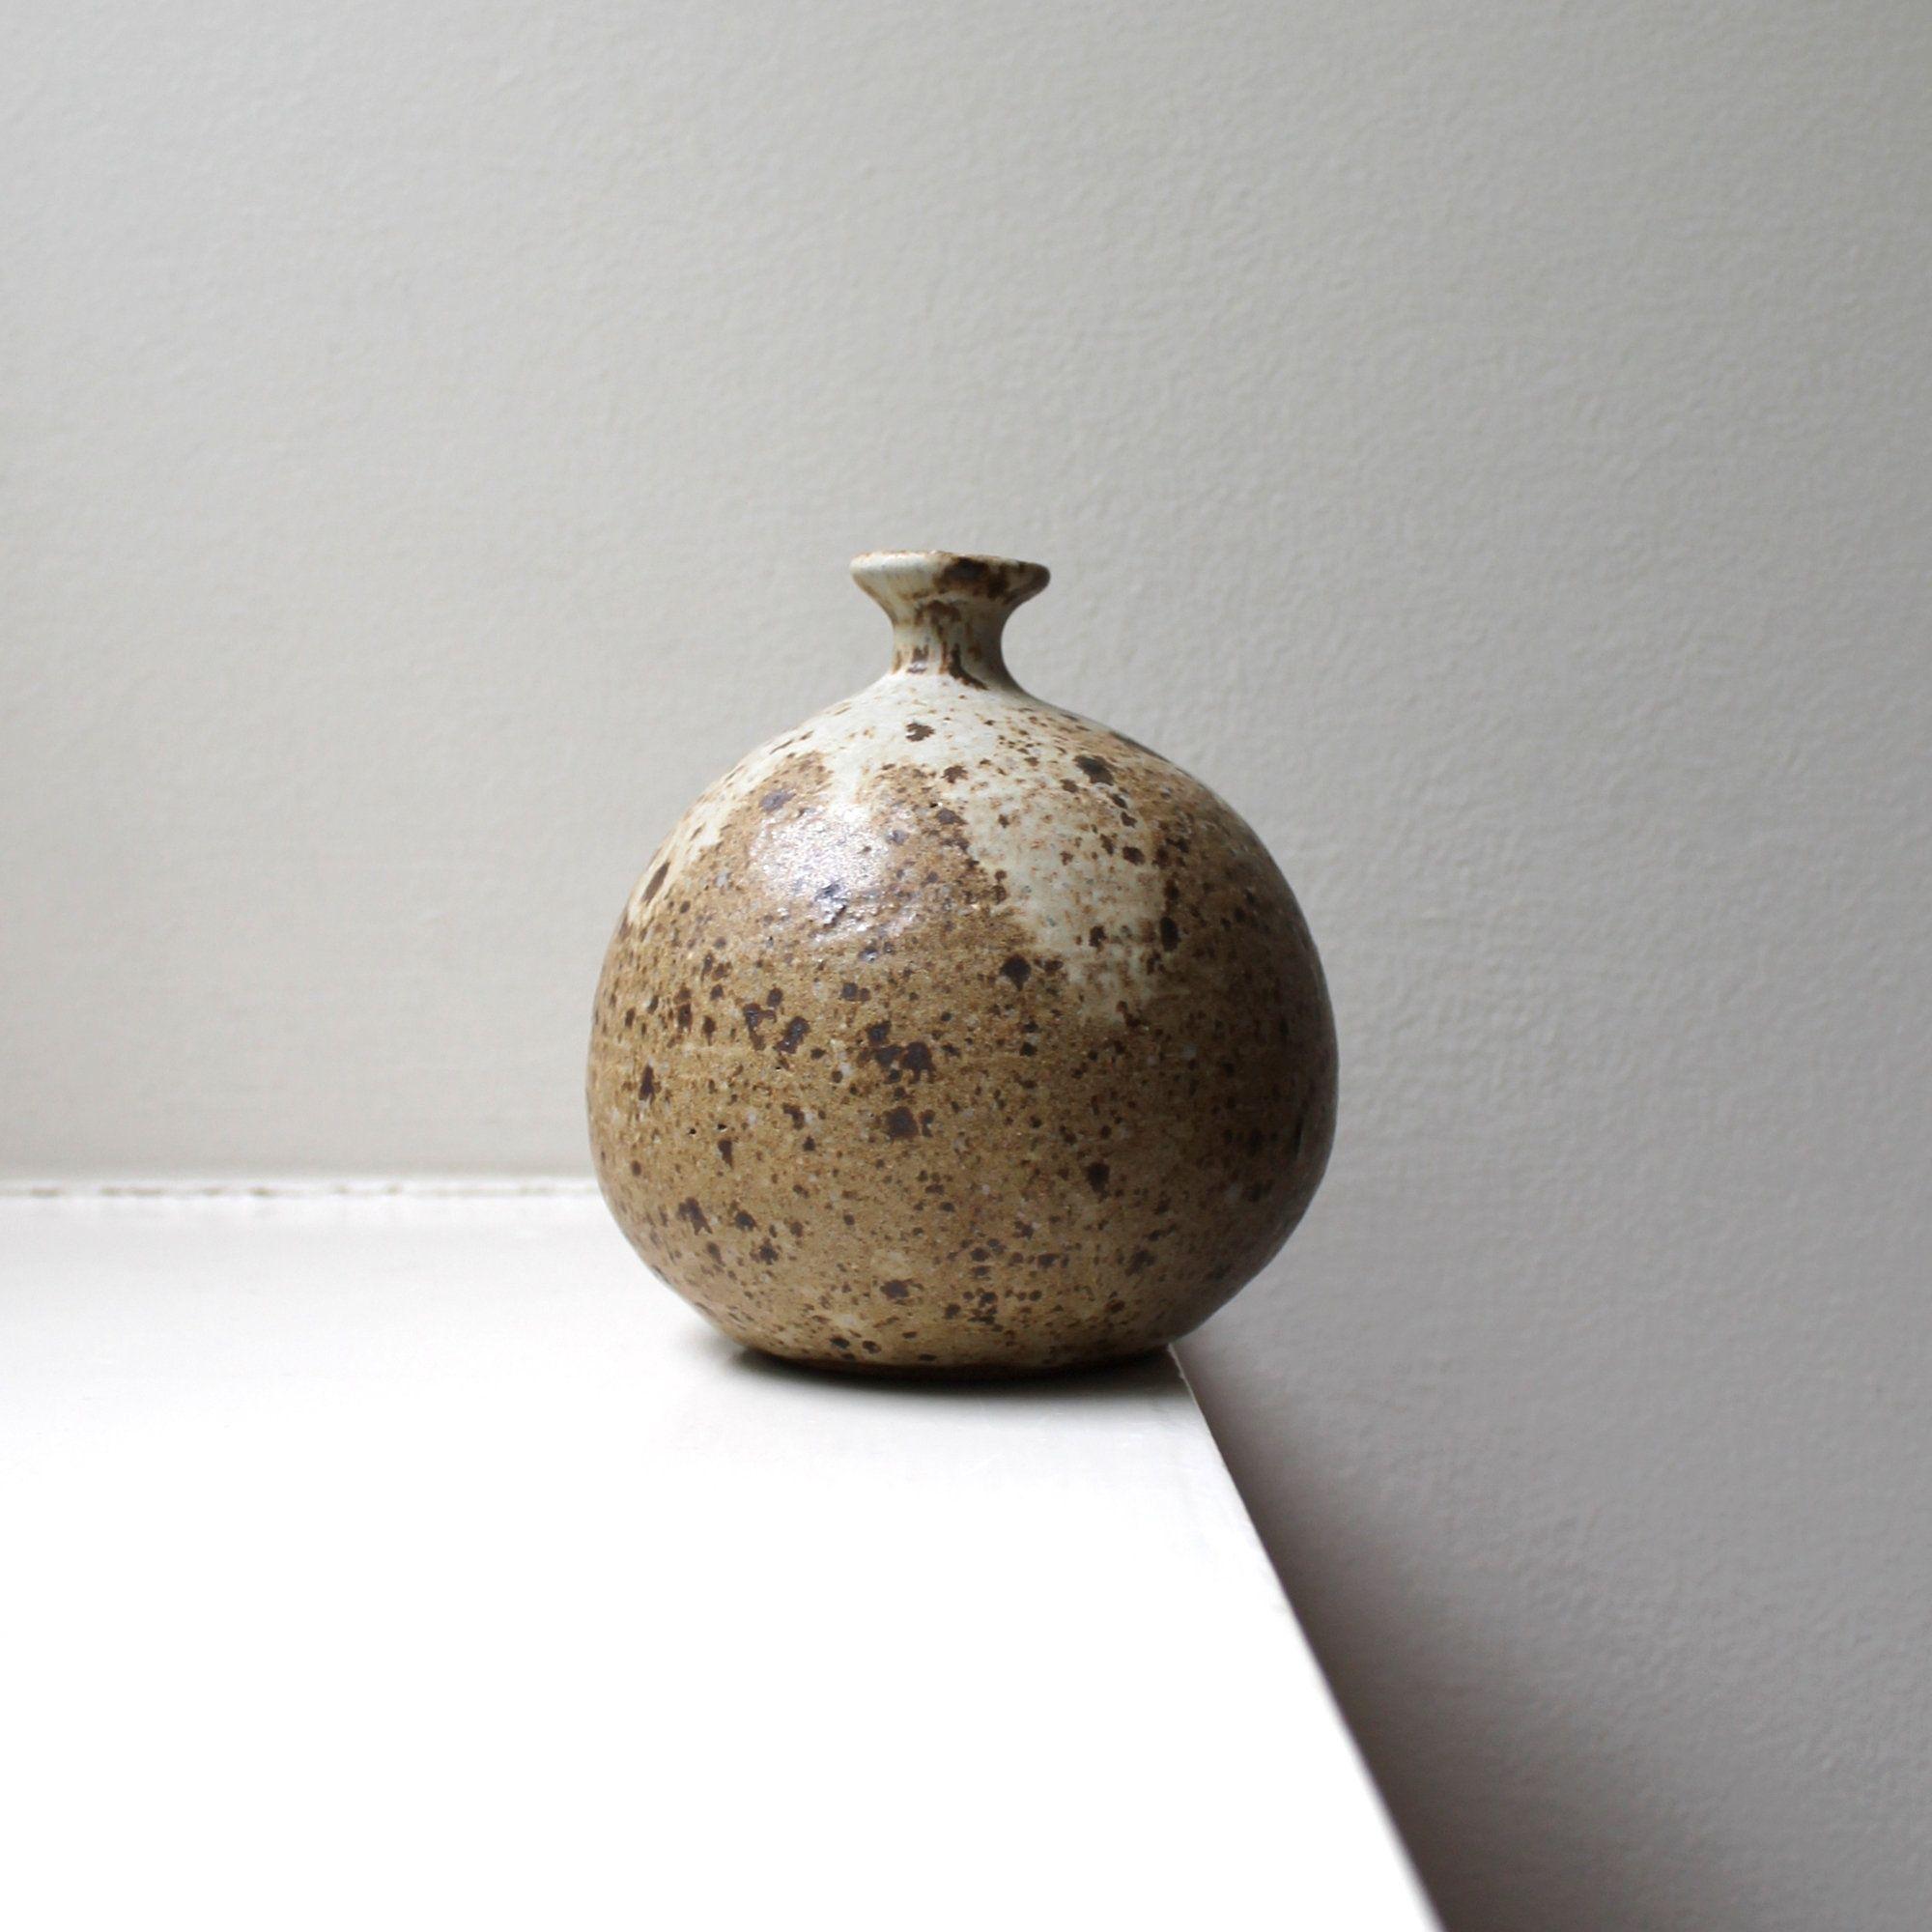 Medium Hand Thrown Vase  Dark Brown Clay Vase Glazed with High Gloss Clear Glaze